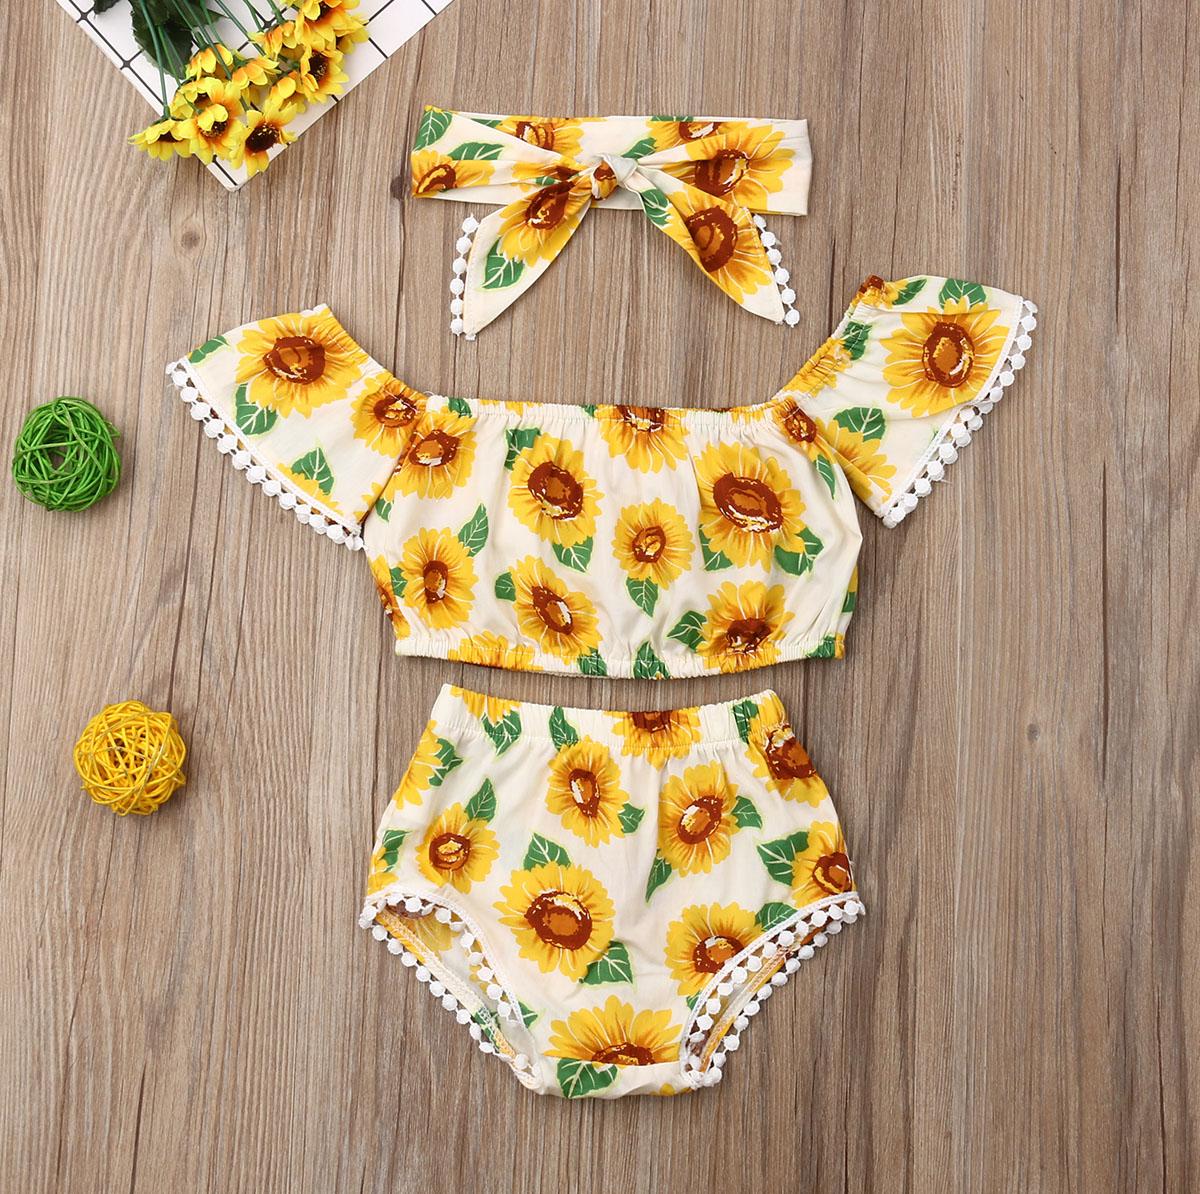 Pudcoco Newborn Baby Girl Clothes Summer Sunflower Print Short Sleeve Tassel Crop Tops Short Pants Headband 3Pcs Outfits Sunsuit